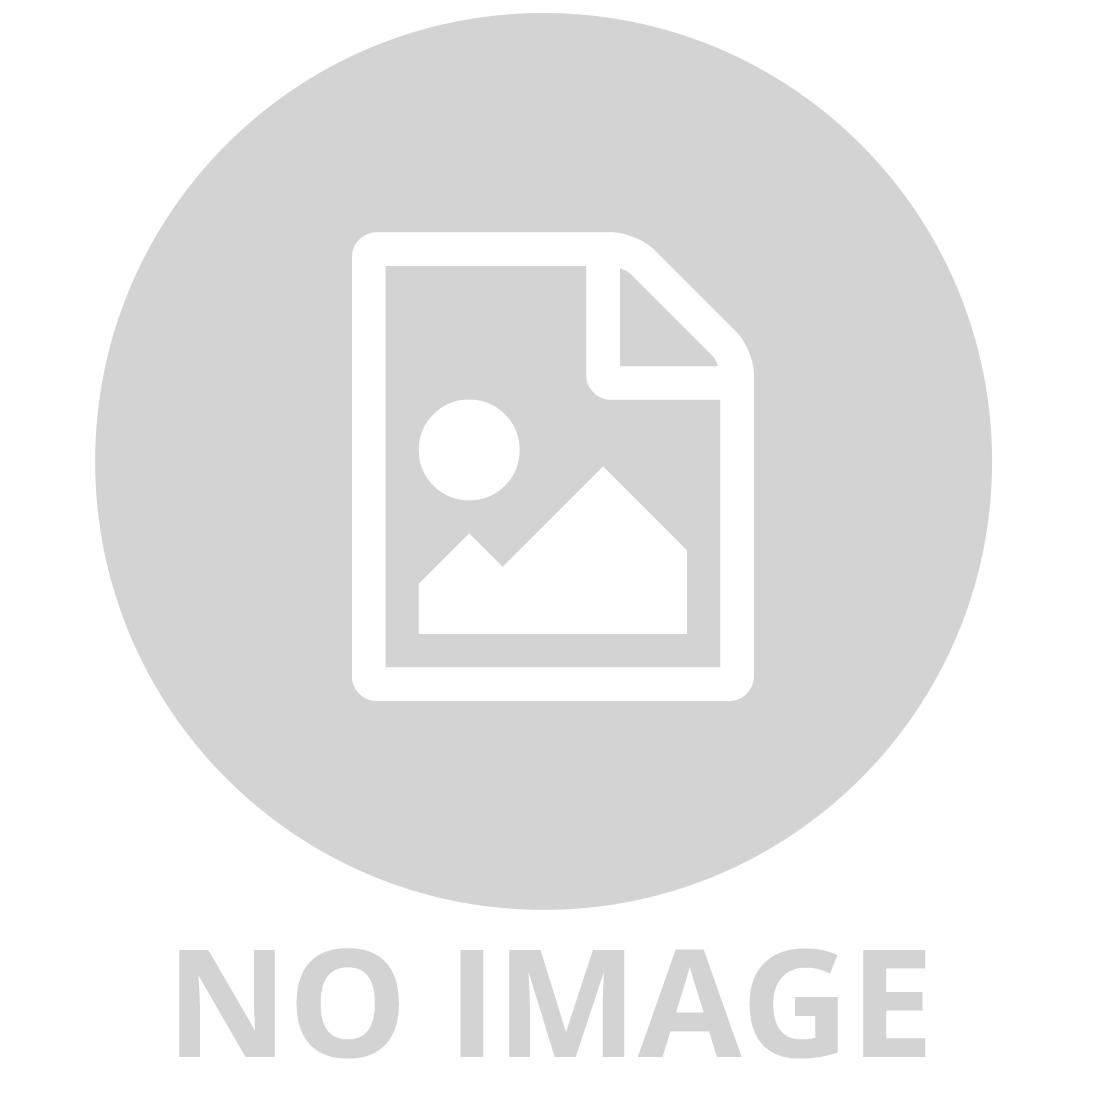 LEGO MINECRAFT 21148 STEVE BIGFIG WITH PARROT